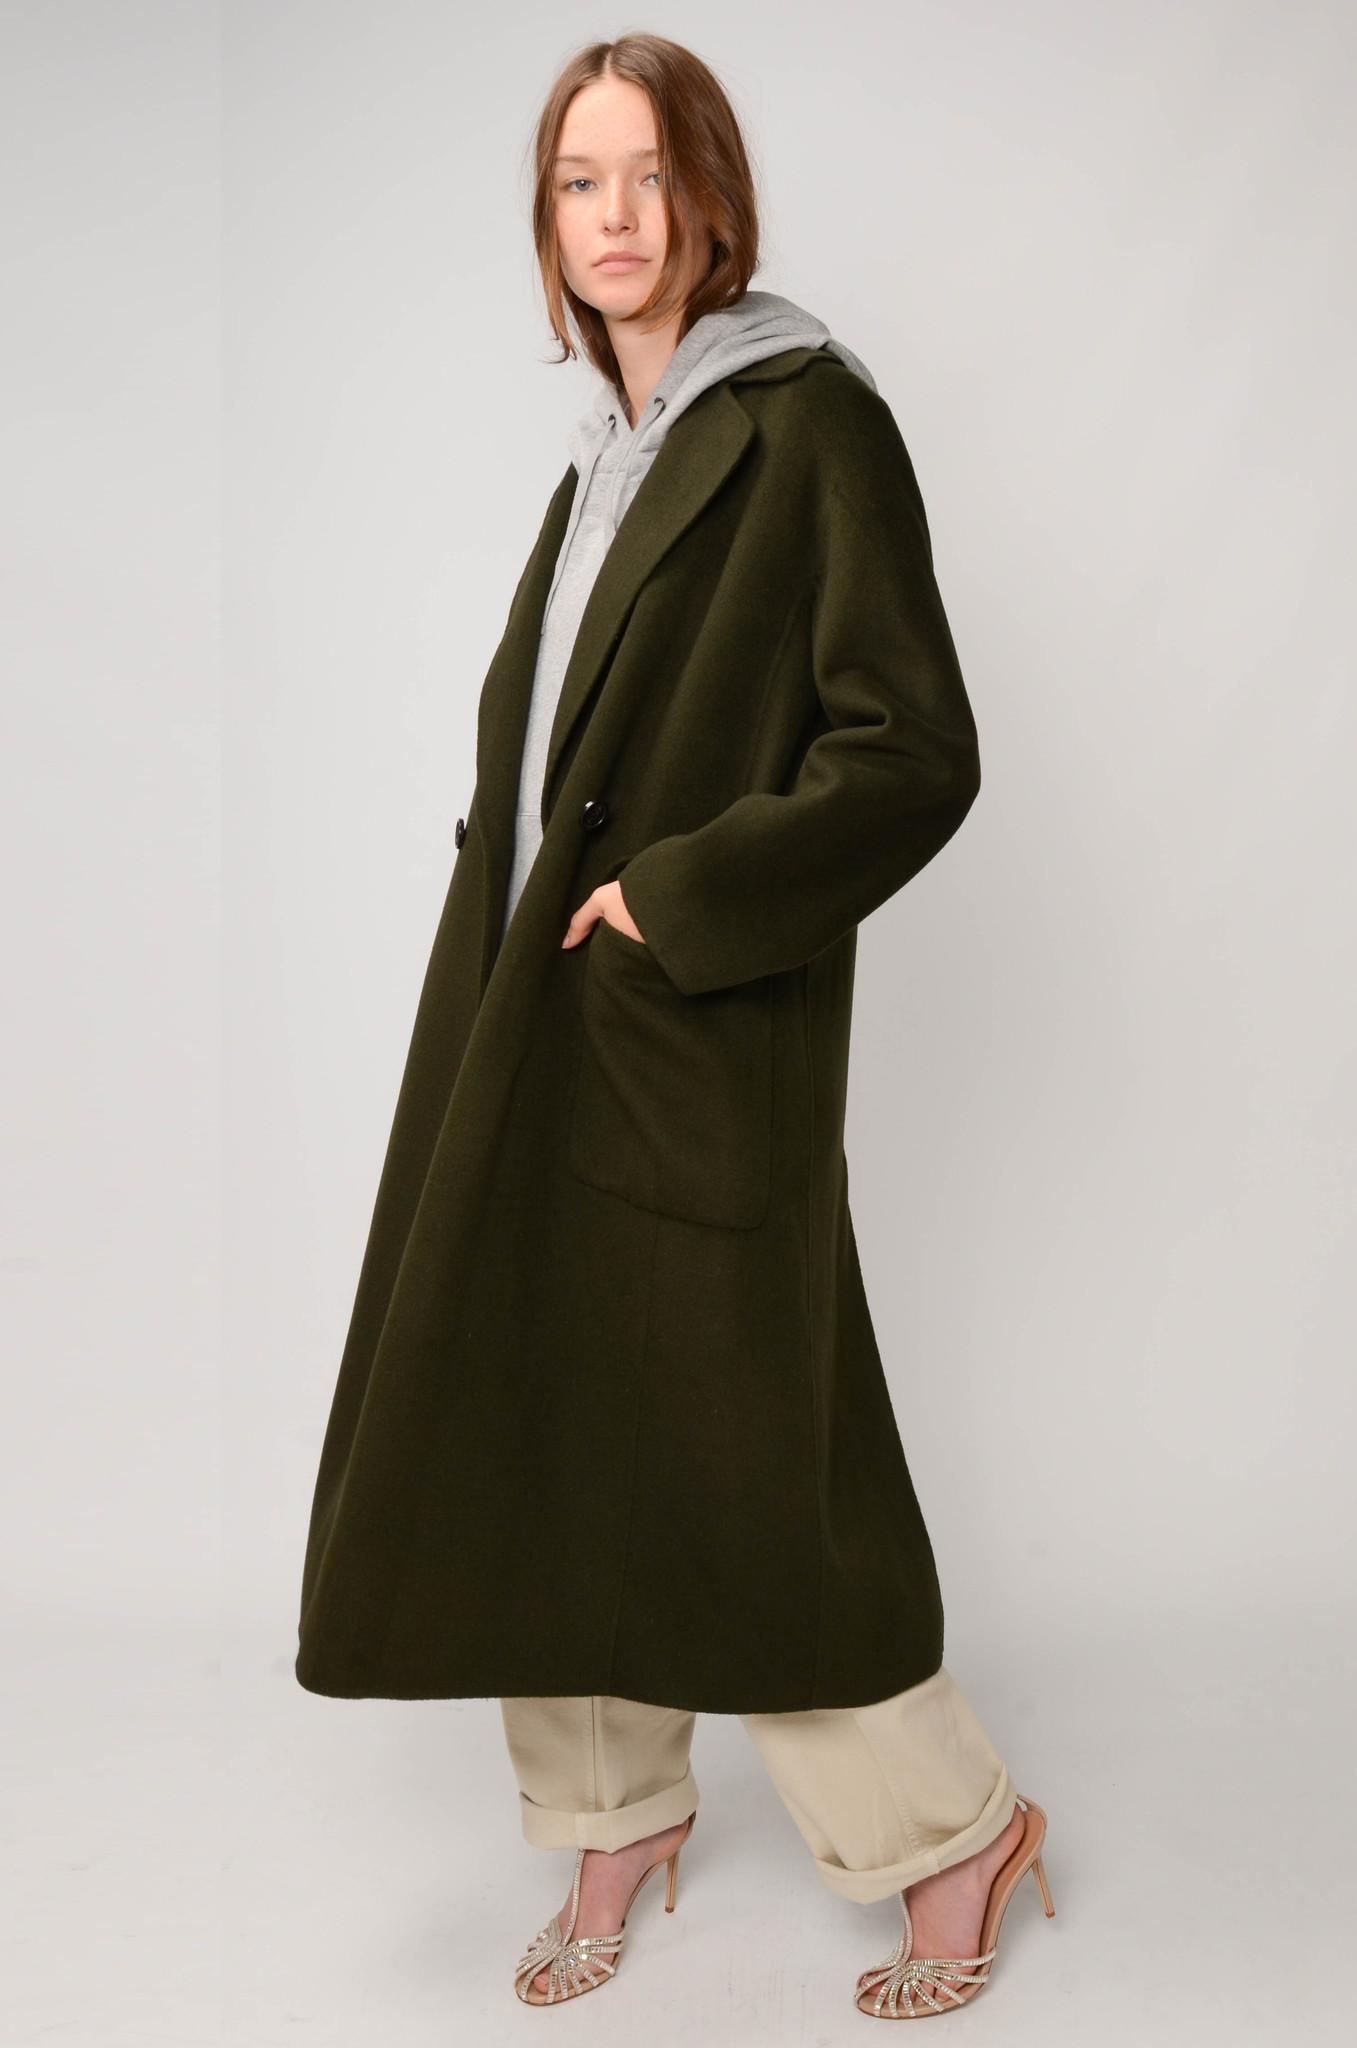 LONG COAT IN DARK GREEN-2